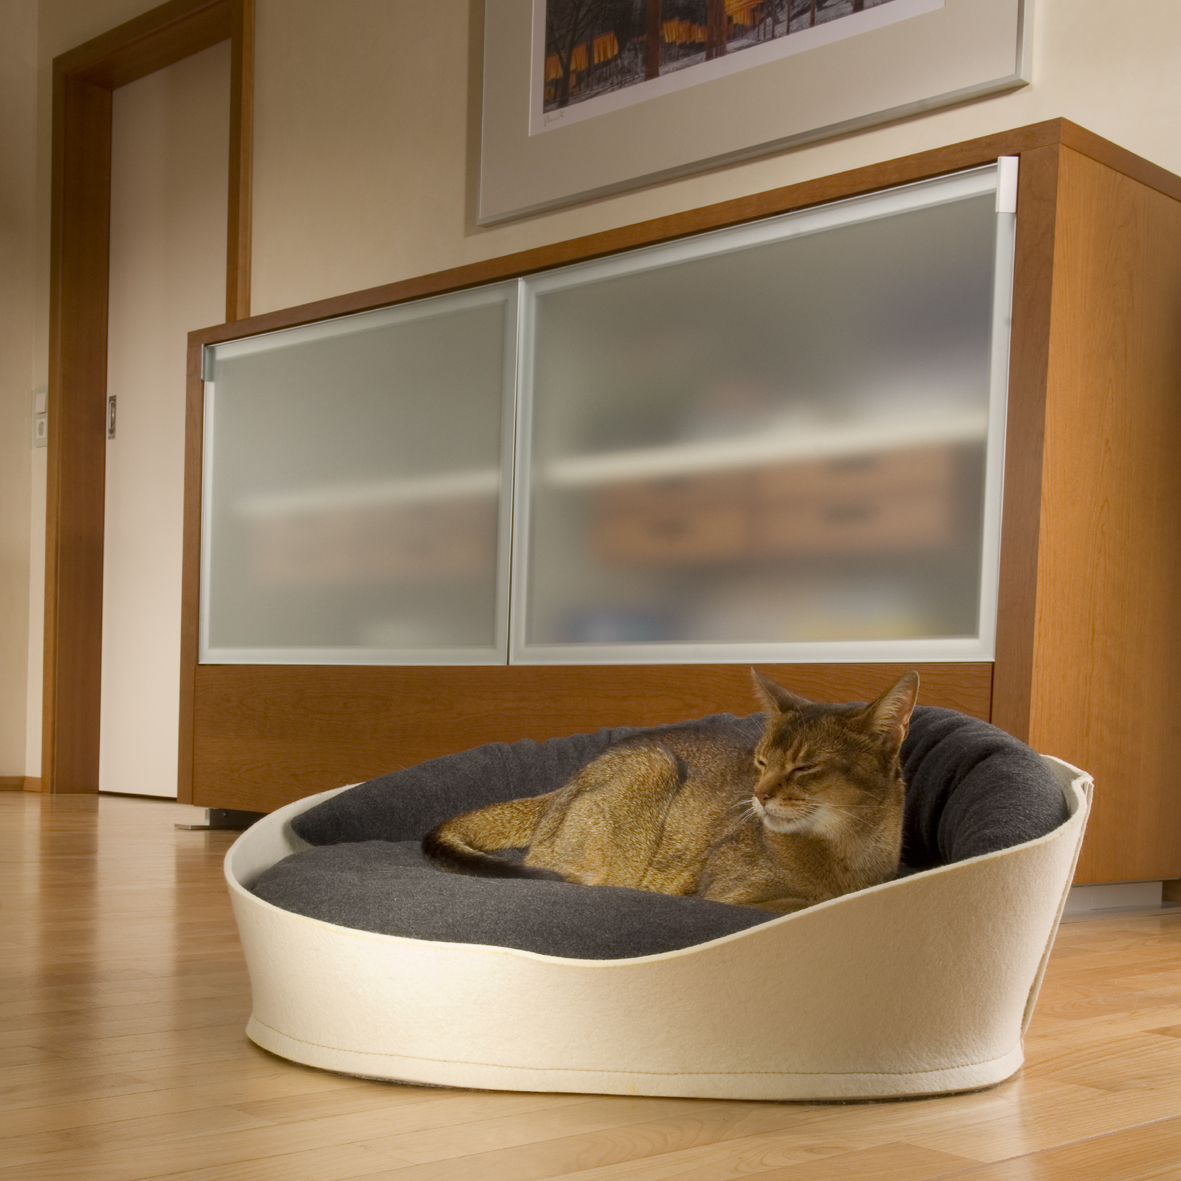 Luxury pet interior design object